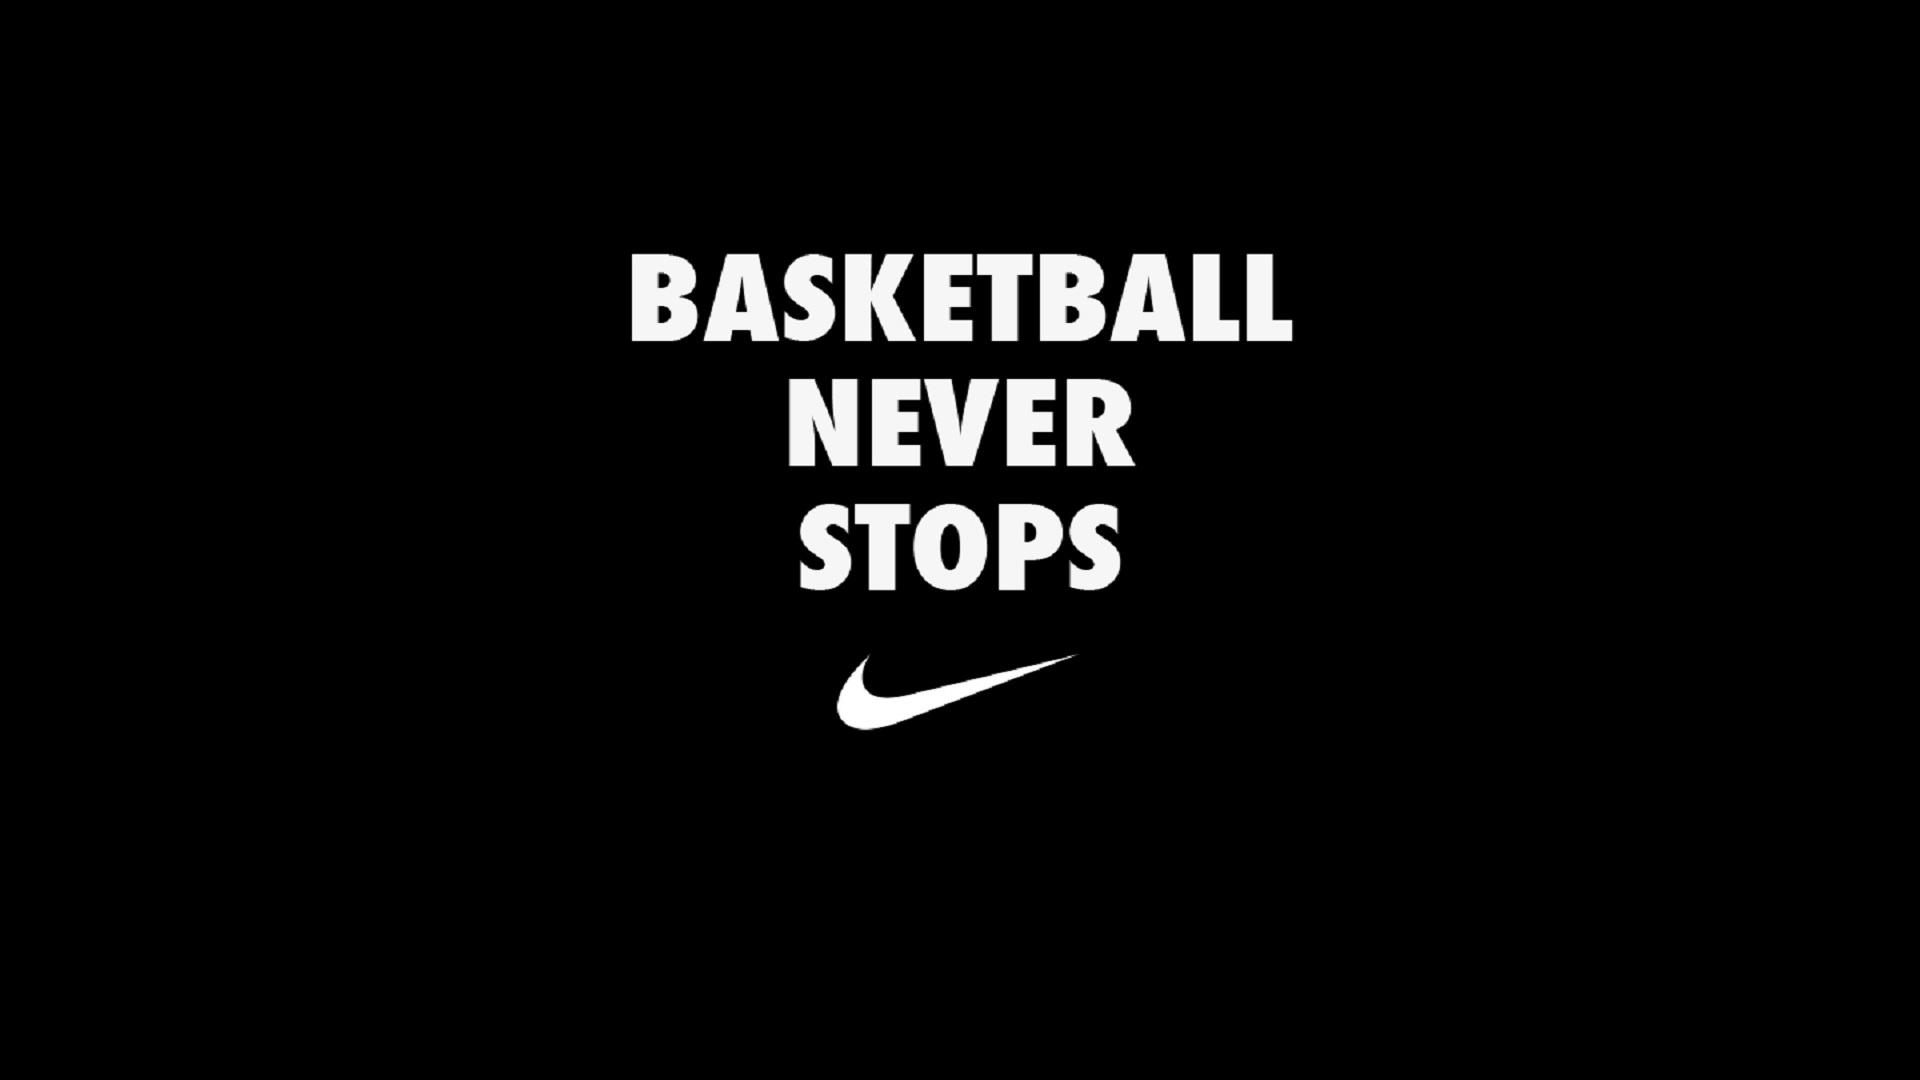 Basketball wallpapers hd